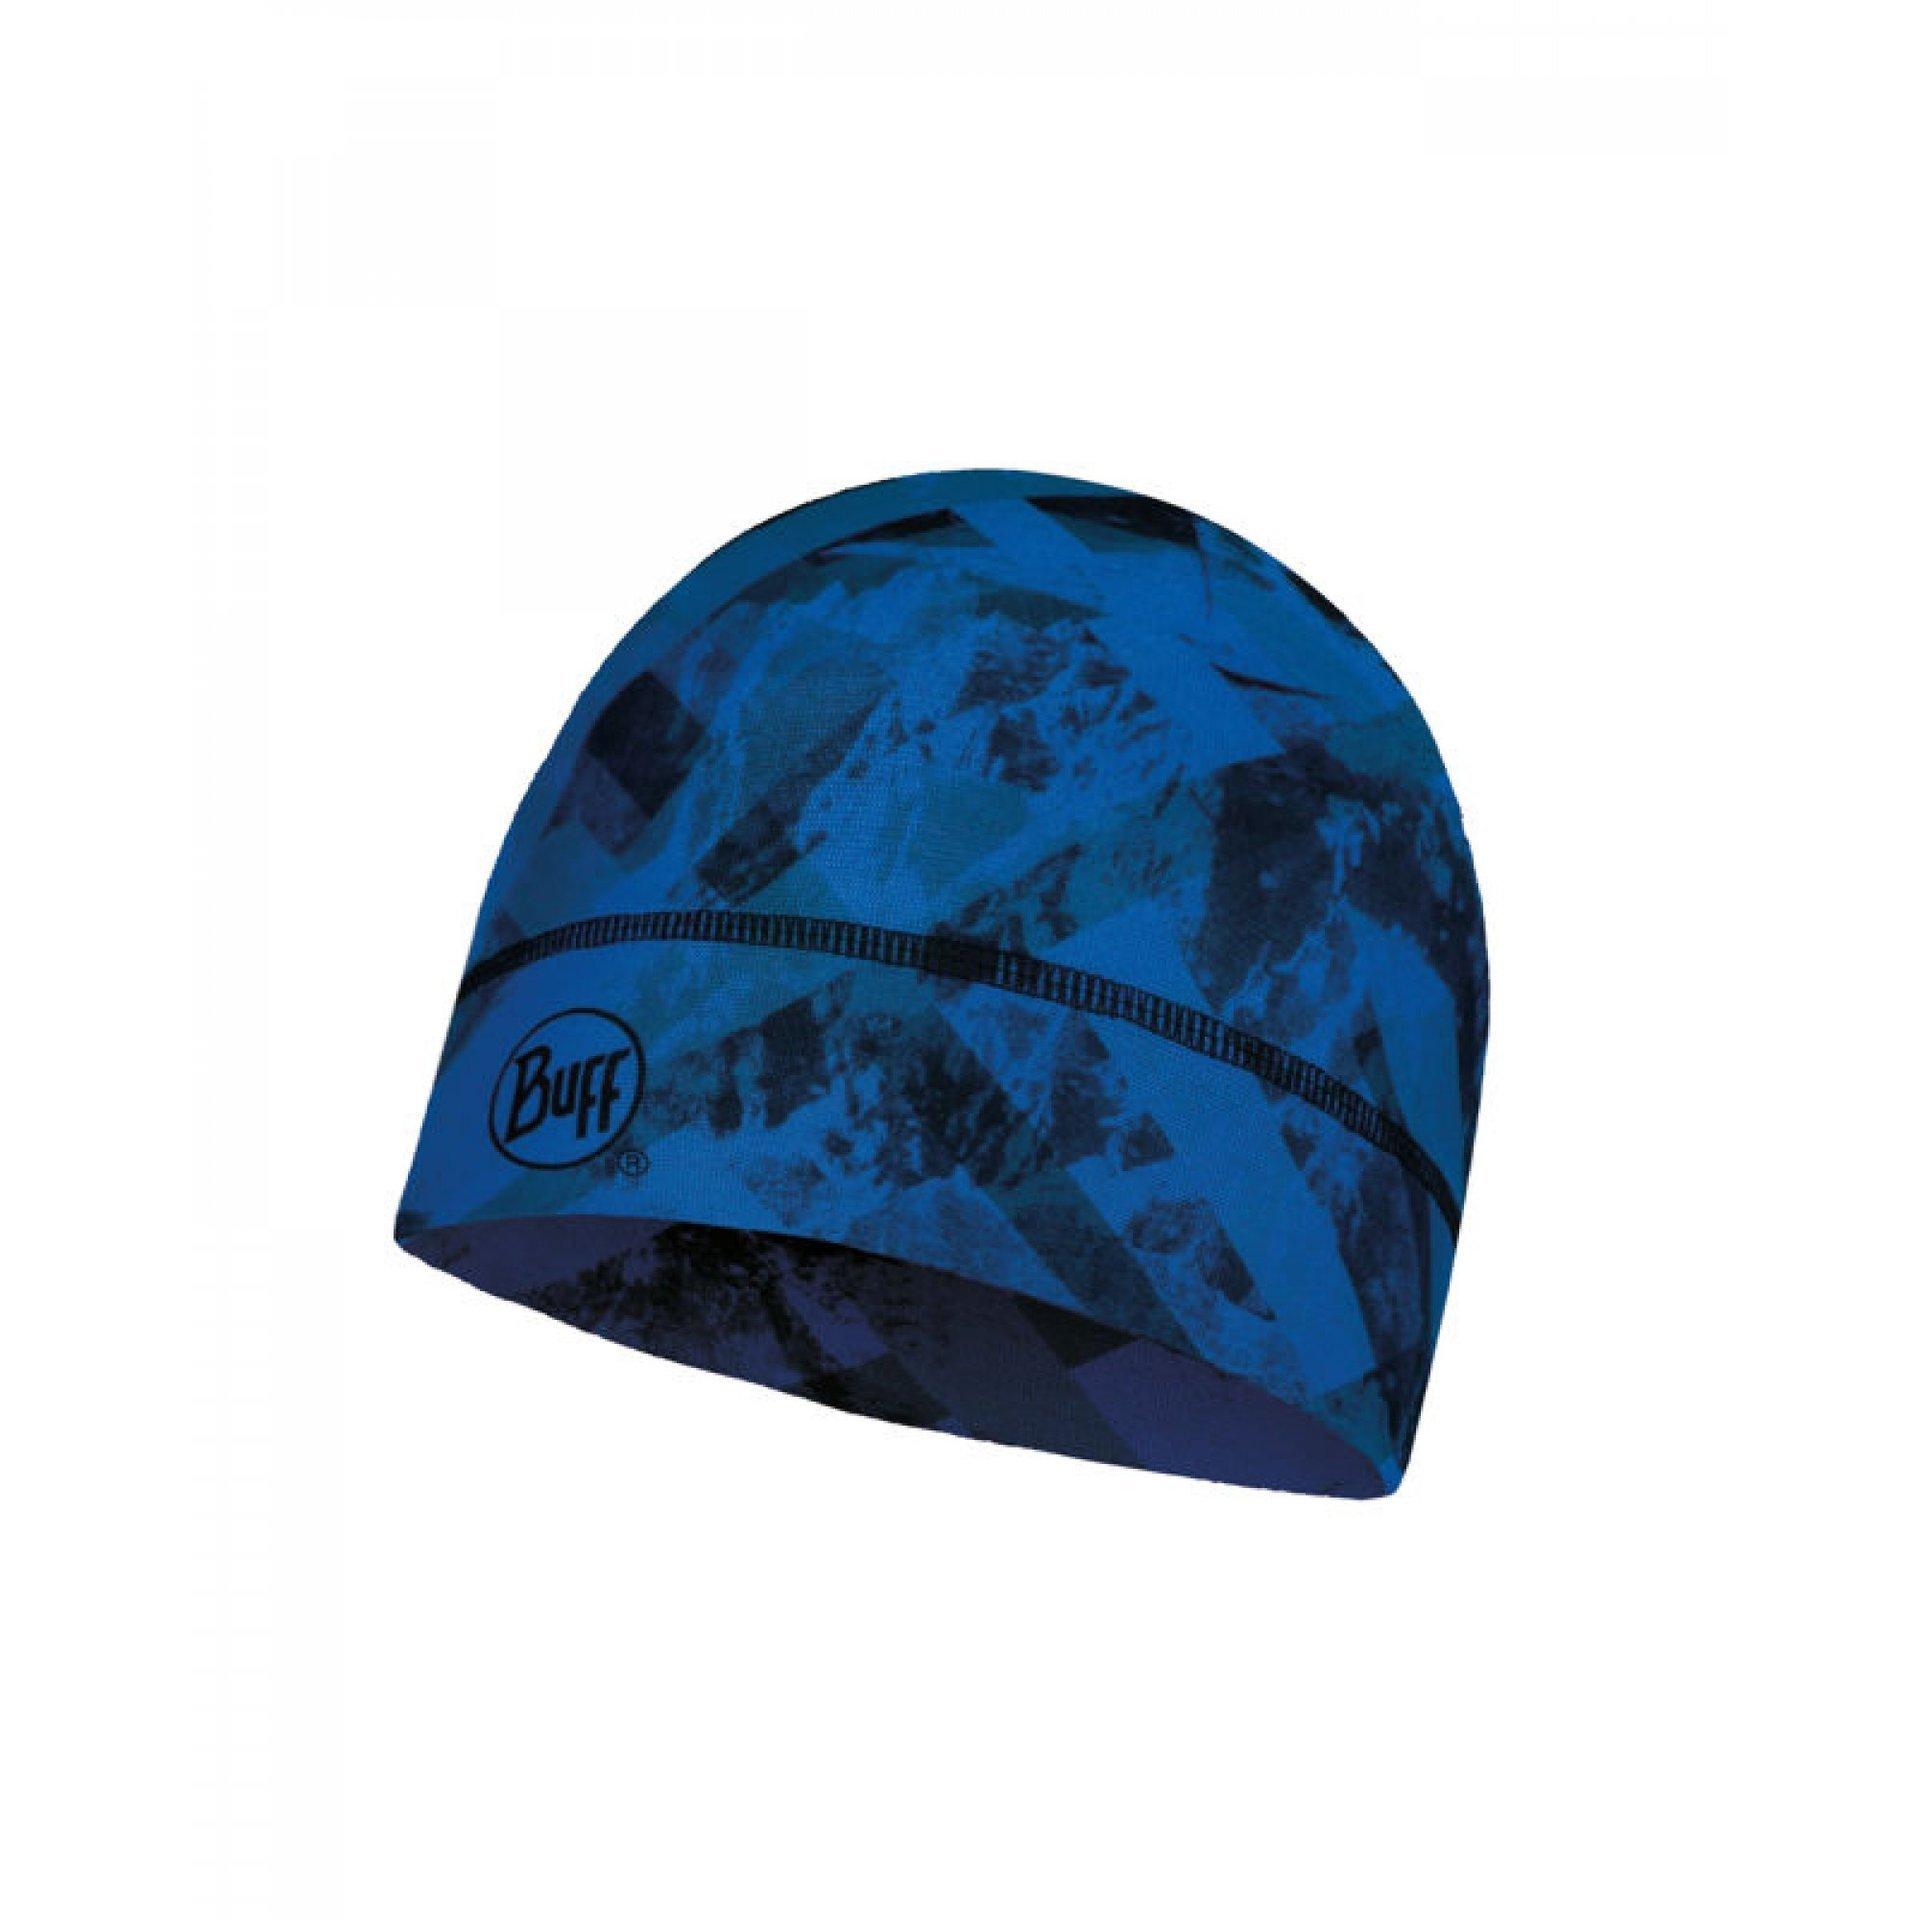 CZAPKA BUFF THERMONET MOUNTAIN TOP CAPE BLUE BUFF